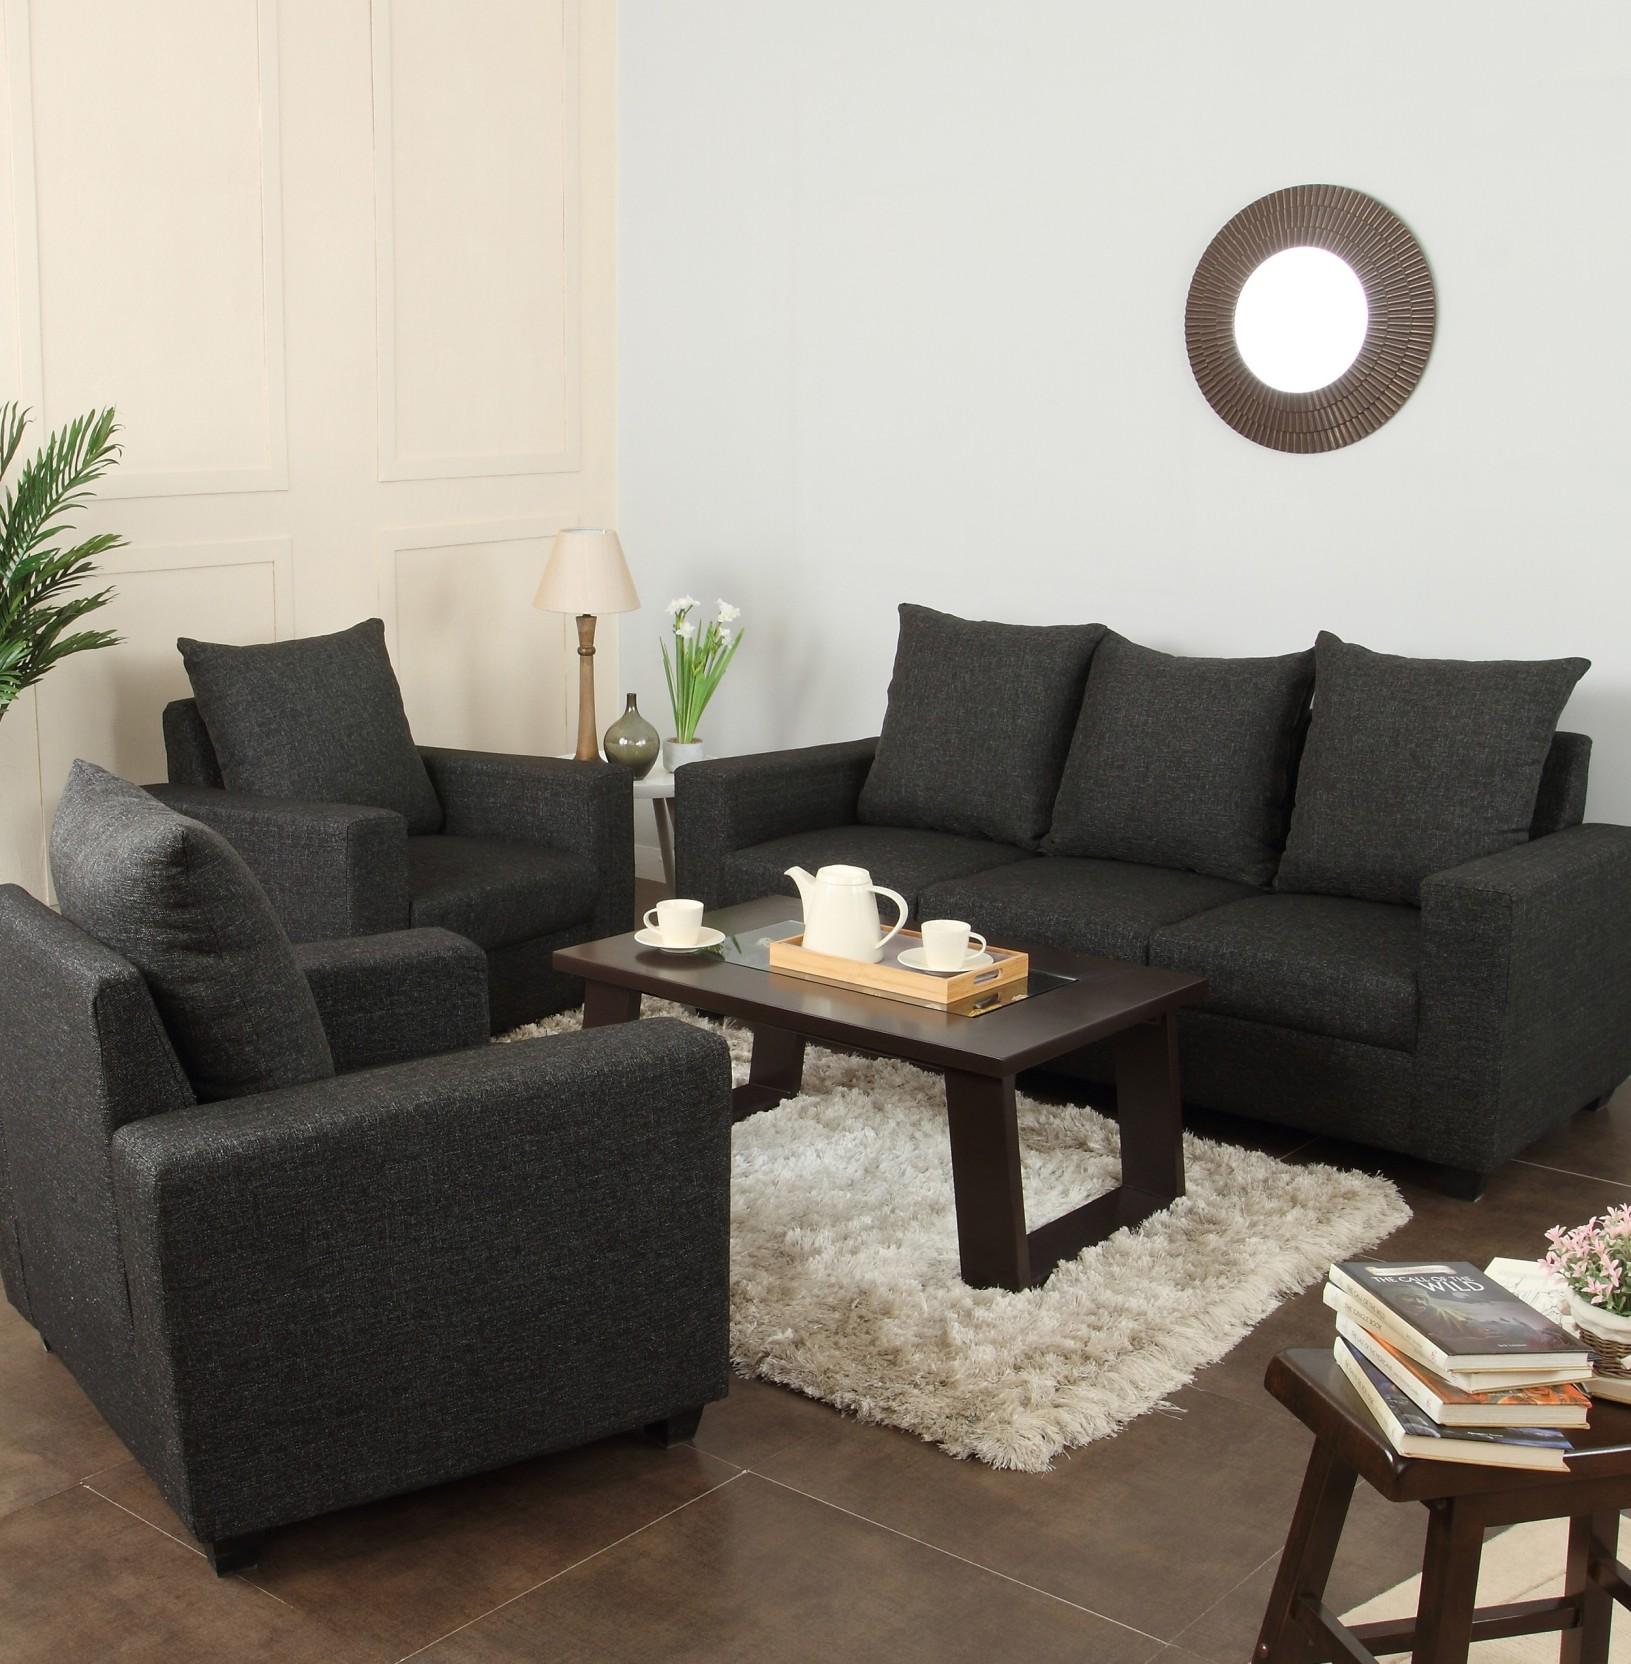 Sectional Gray Sofa Set: Furnicity Fabric 3 + 1 + 1 Grey Sofa Set Price In India